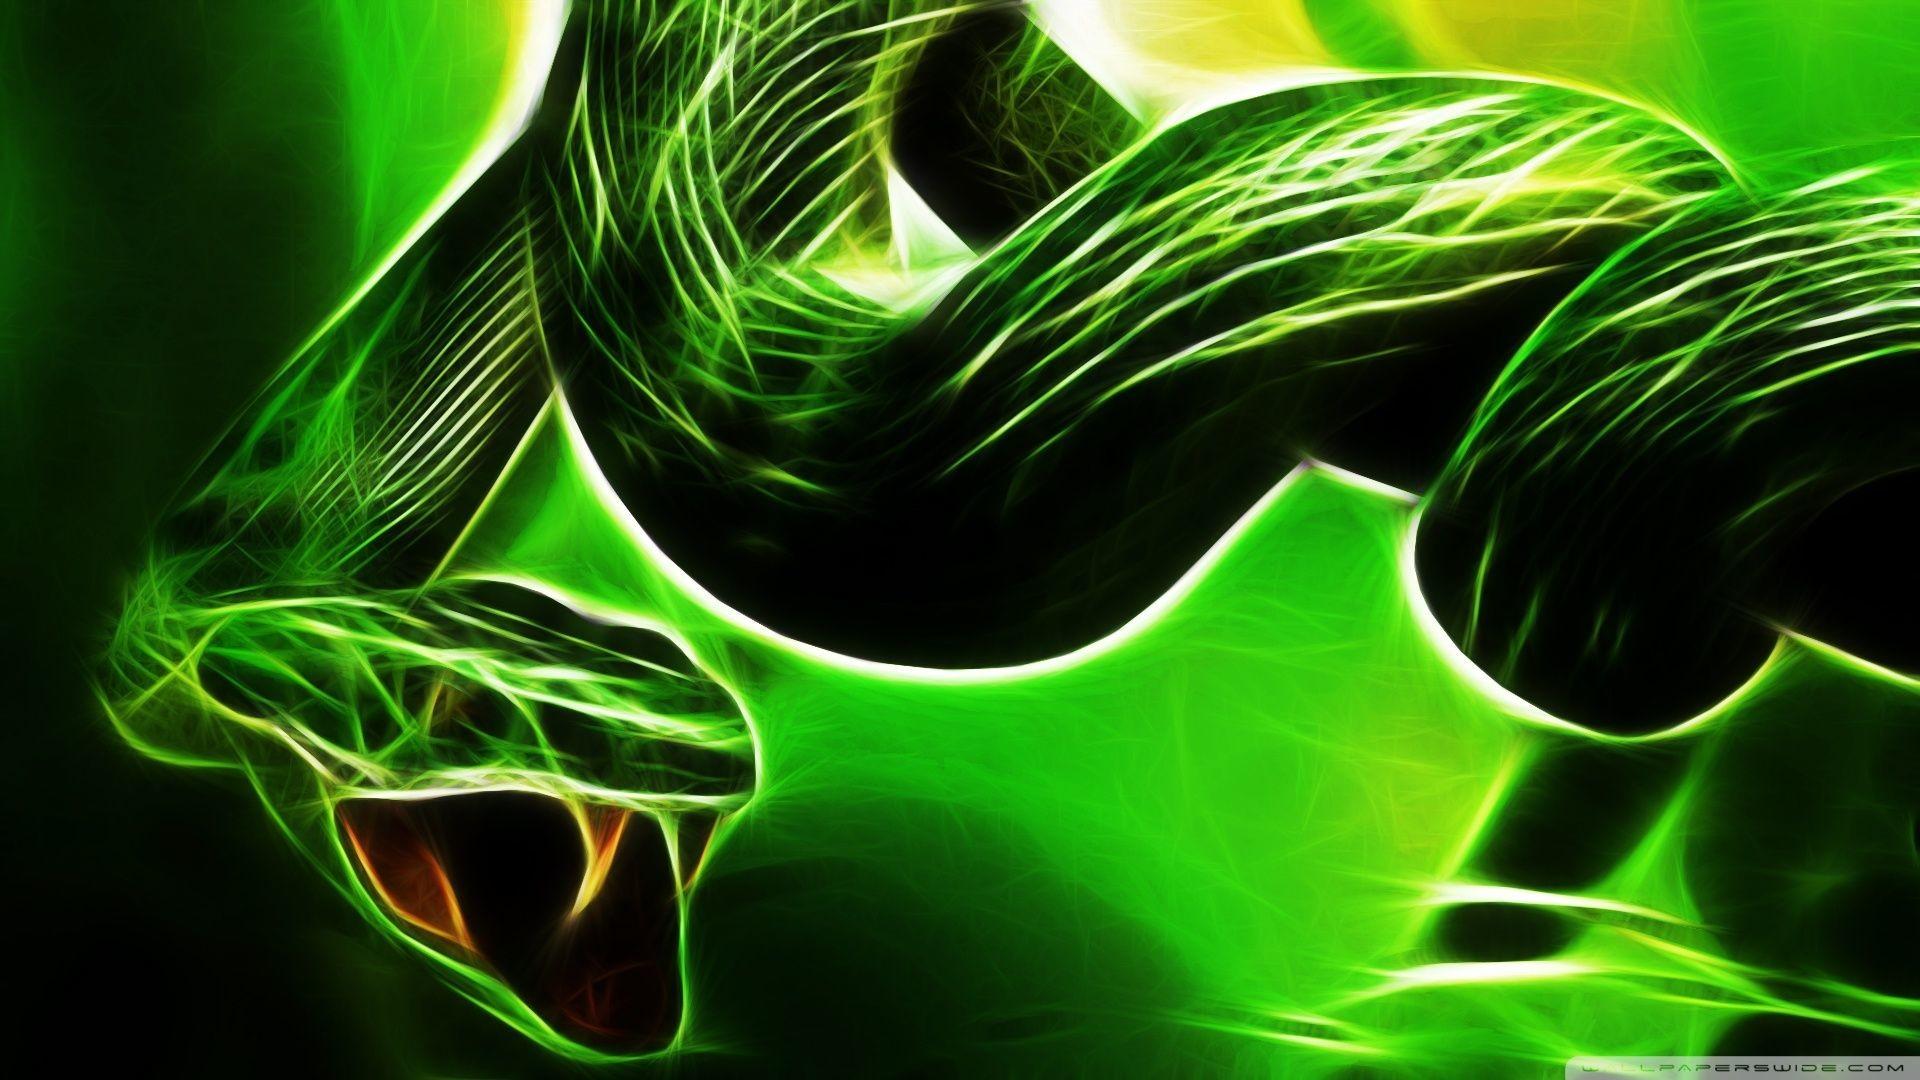 Res: 1920x1080, Snake Wallpapers Wallpaper 1024×768 Black Snake Wallpapers (43 Wallpapers)  | Adorable Wallpapers